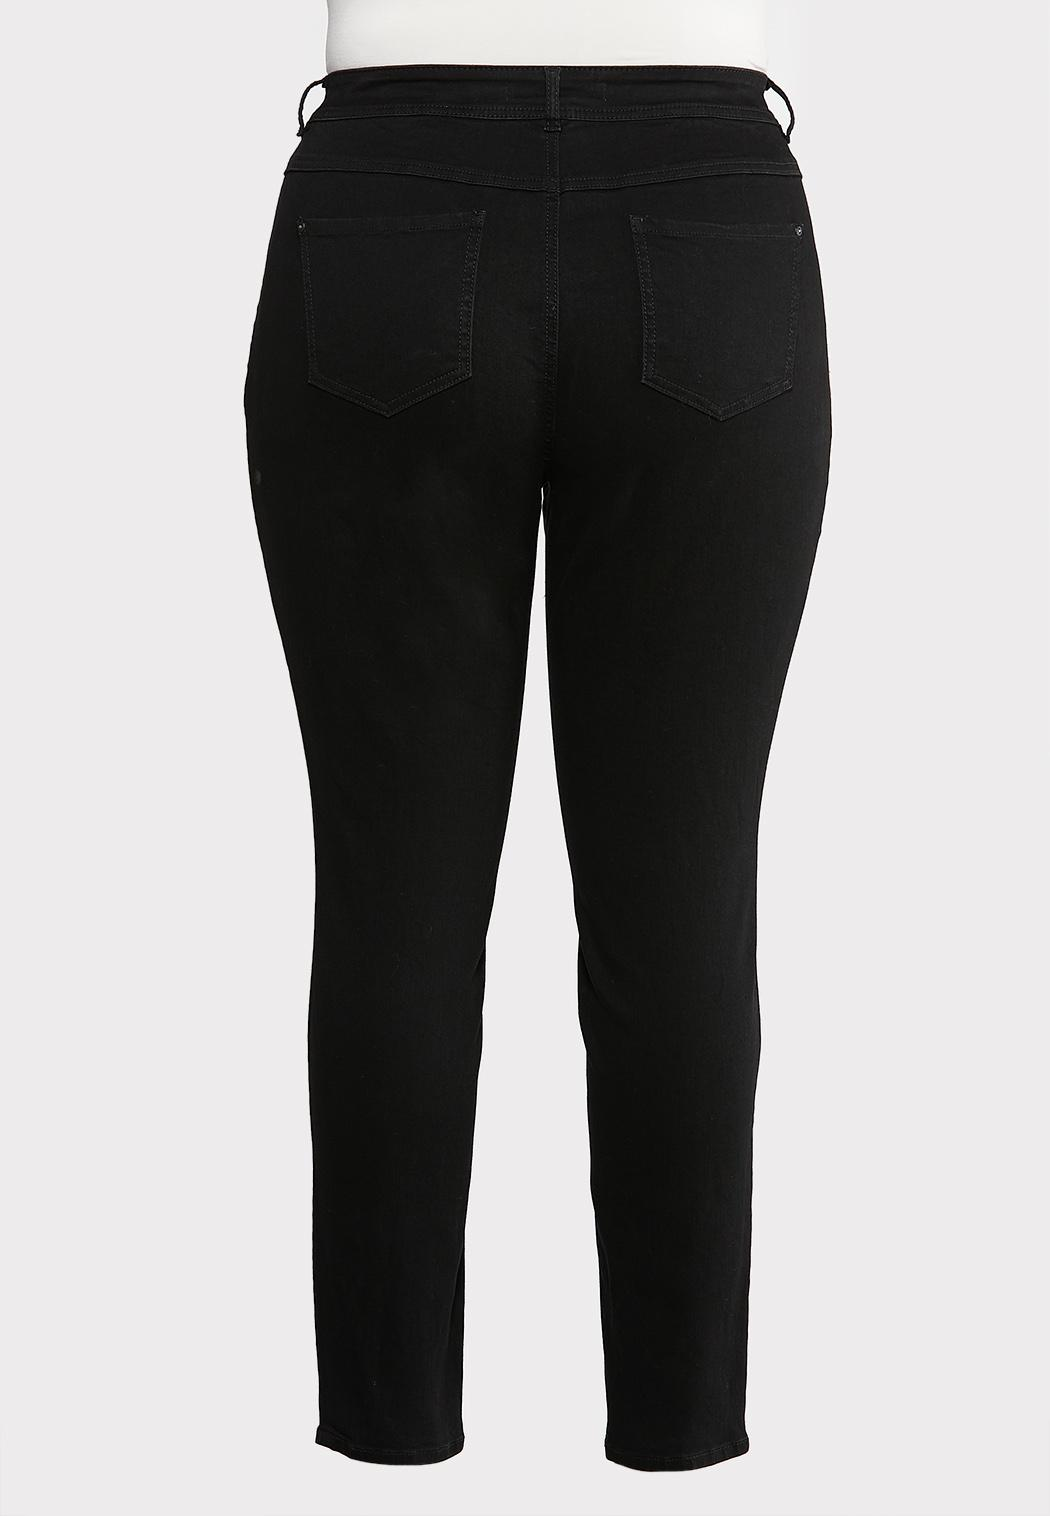 Plus Size Washed Black Jeggings (Item #43935358)